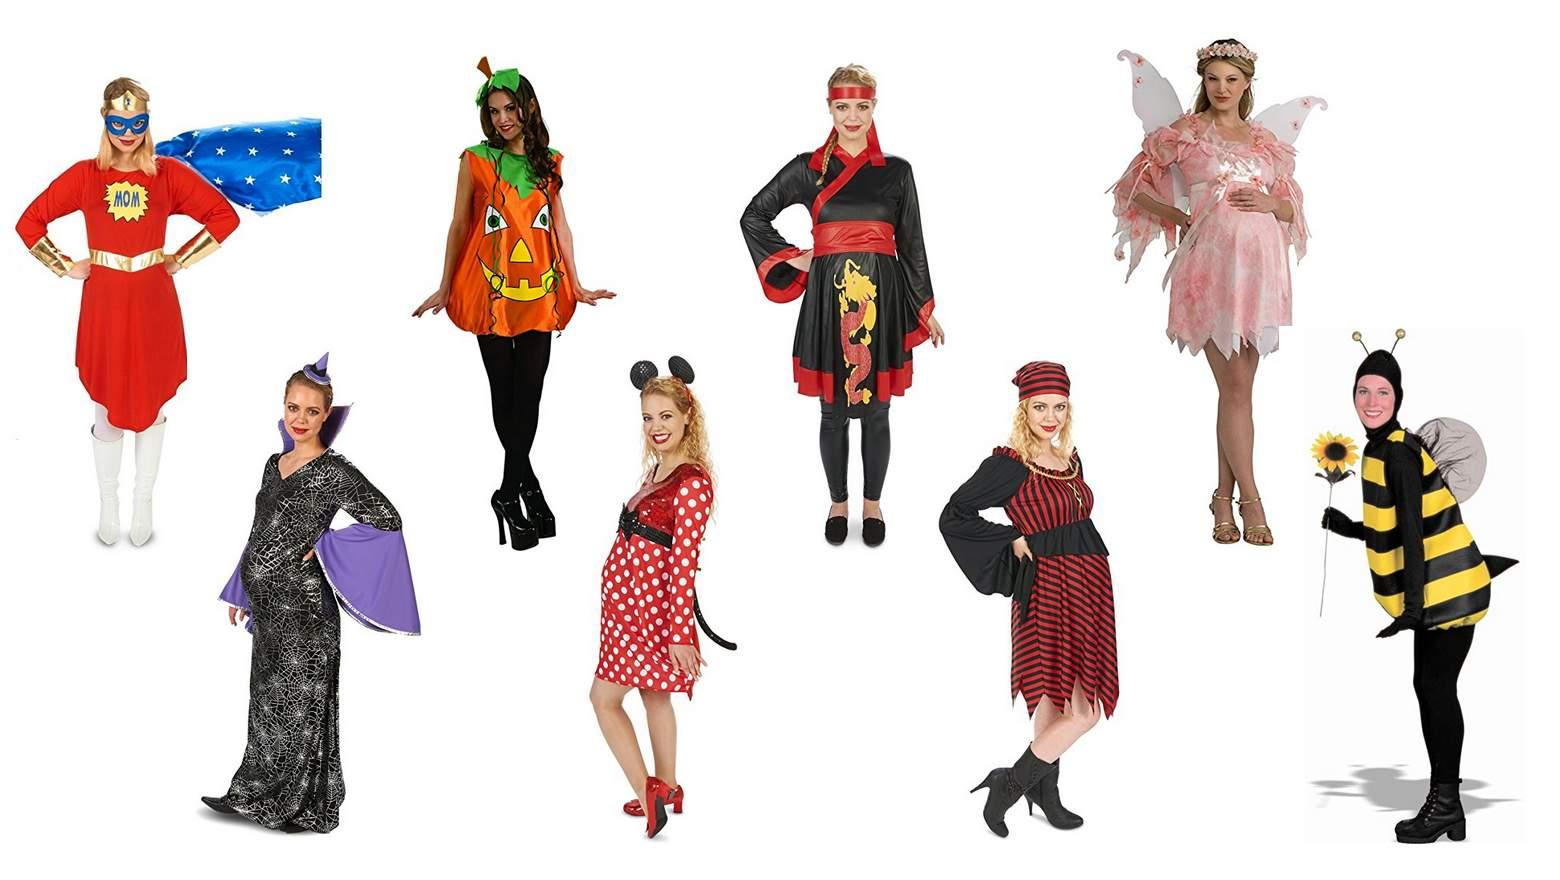 20 costumi di Carnevale da indossare in gravidanza